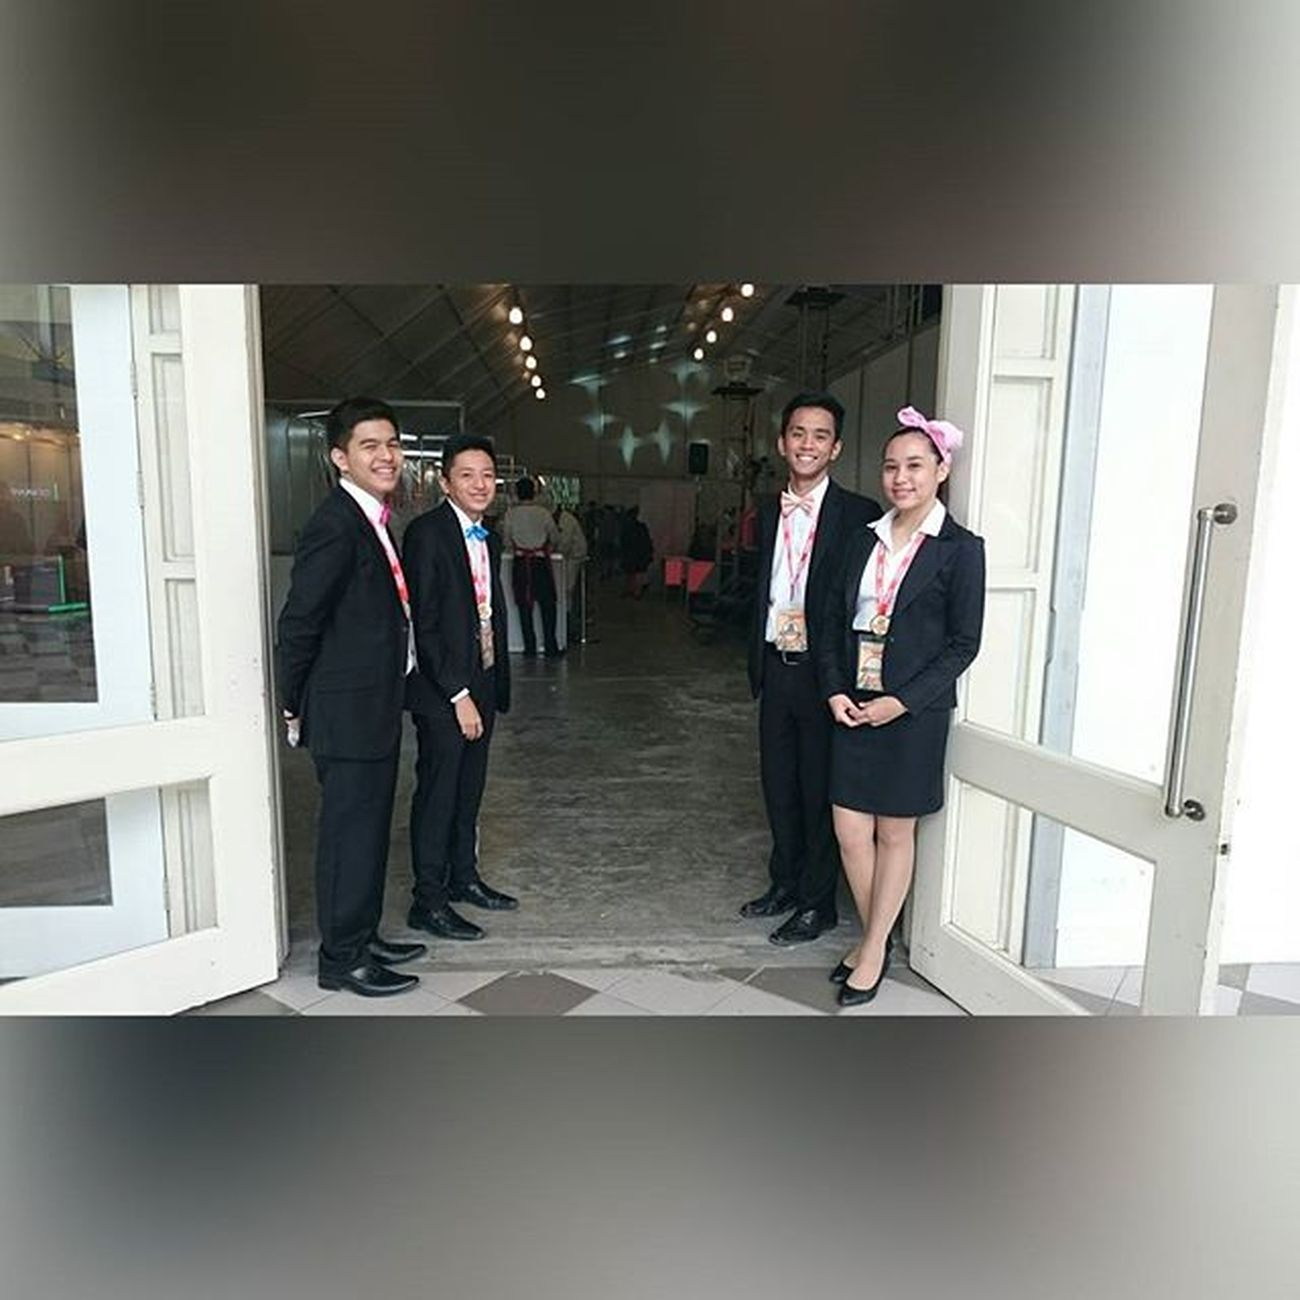 Welcome to the 43rd YHE - 9th MAFBEX! 📷 . . . MAFBEX YHE 9thMAFBEX 43rdYHE themanansala